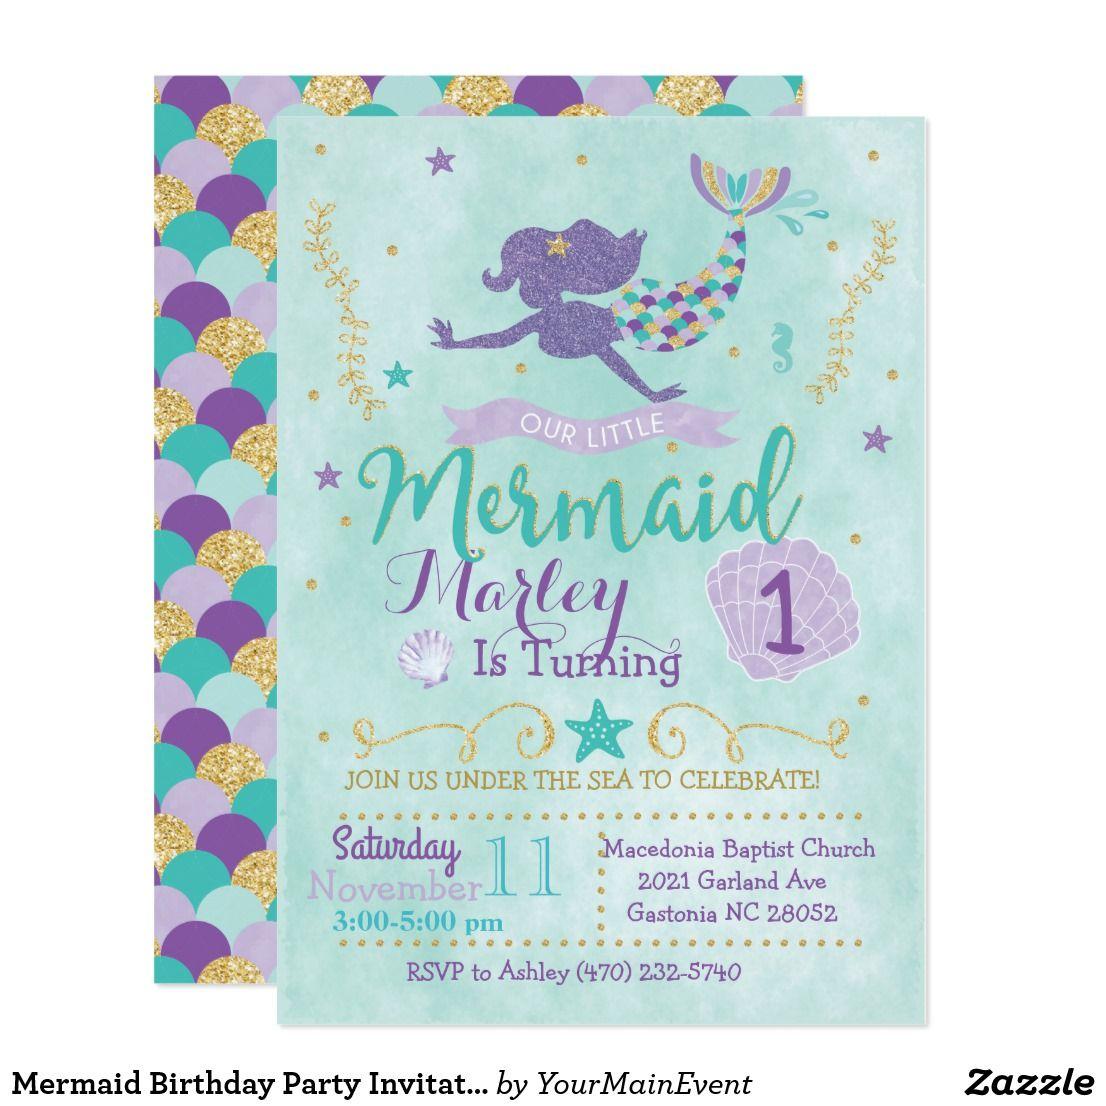 Mermaid birthday party invitation purple teal gold birthdays